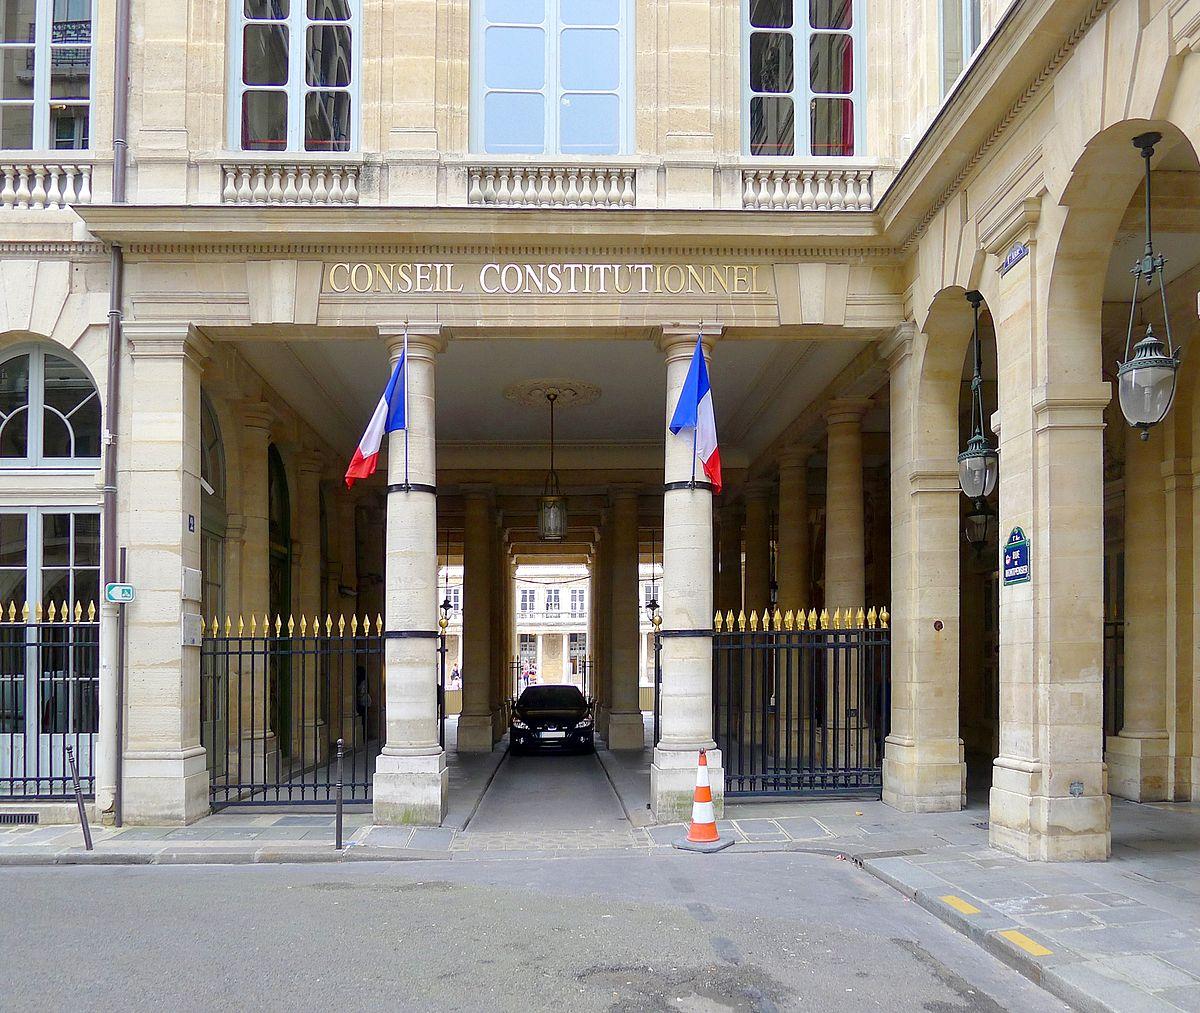 Hotel De France A Auch